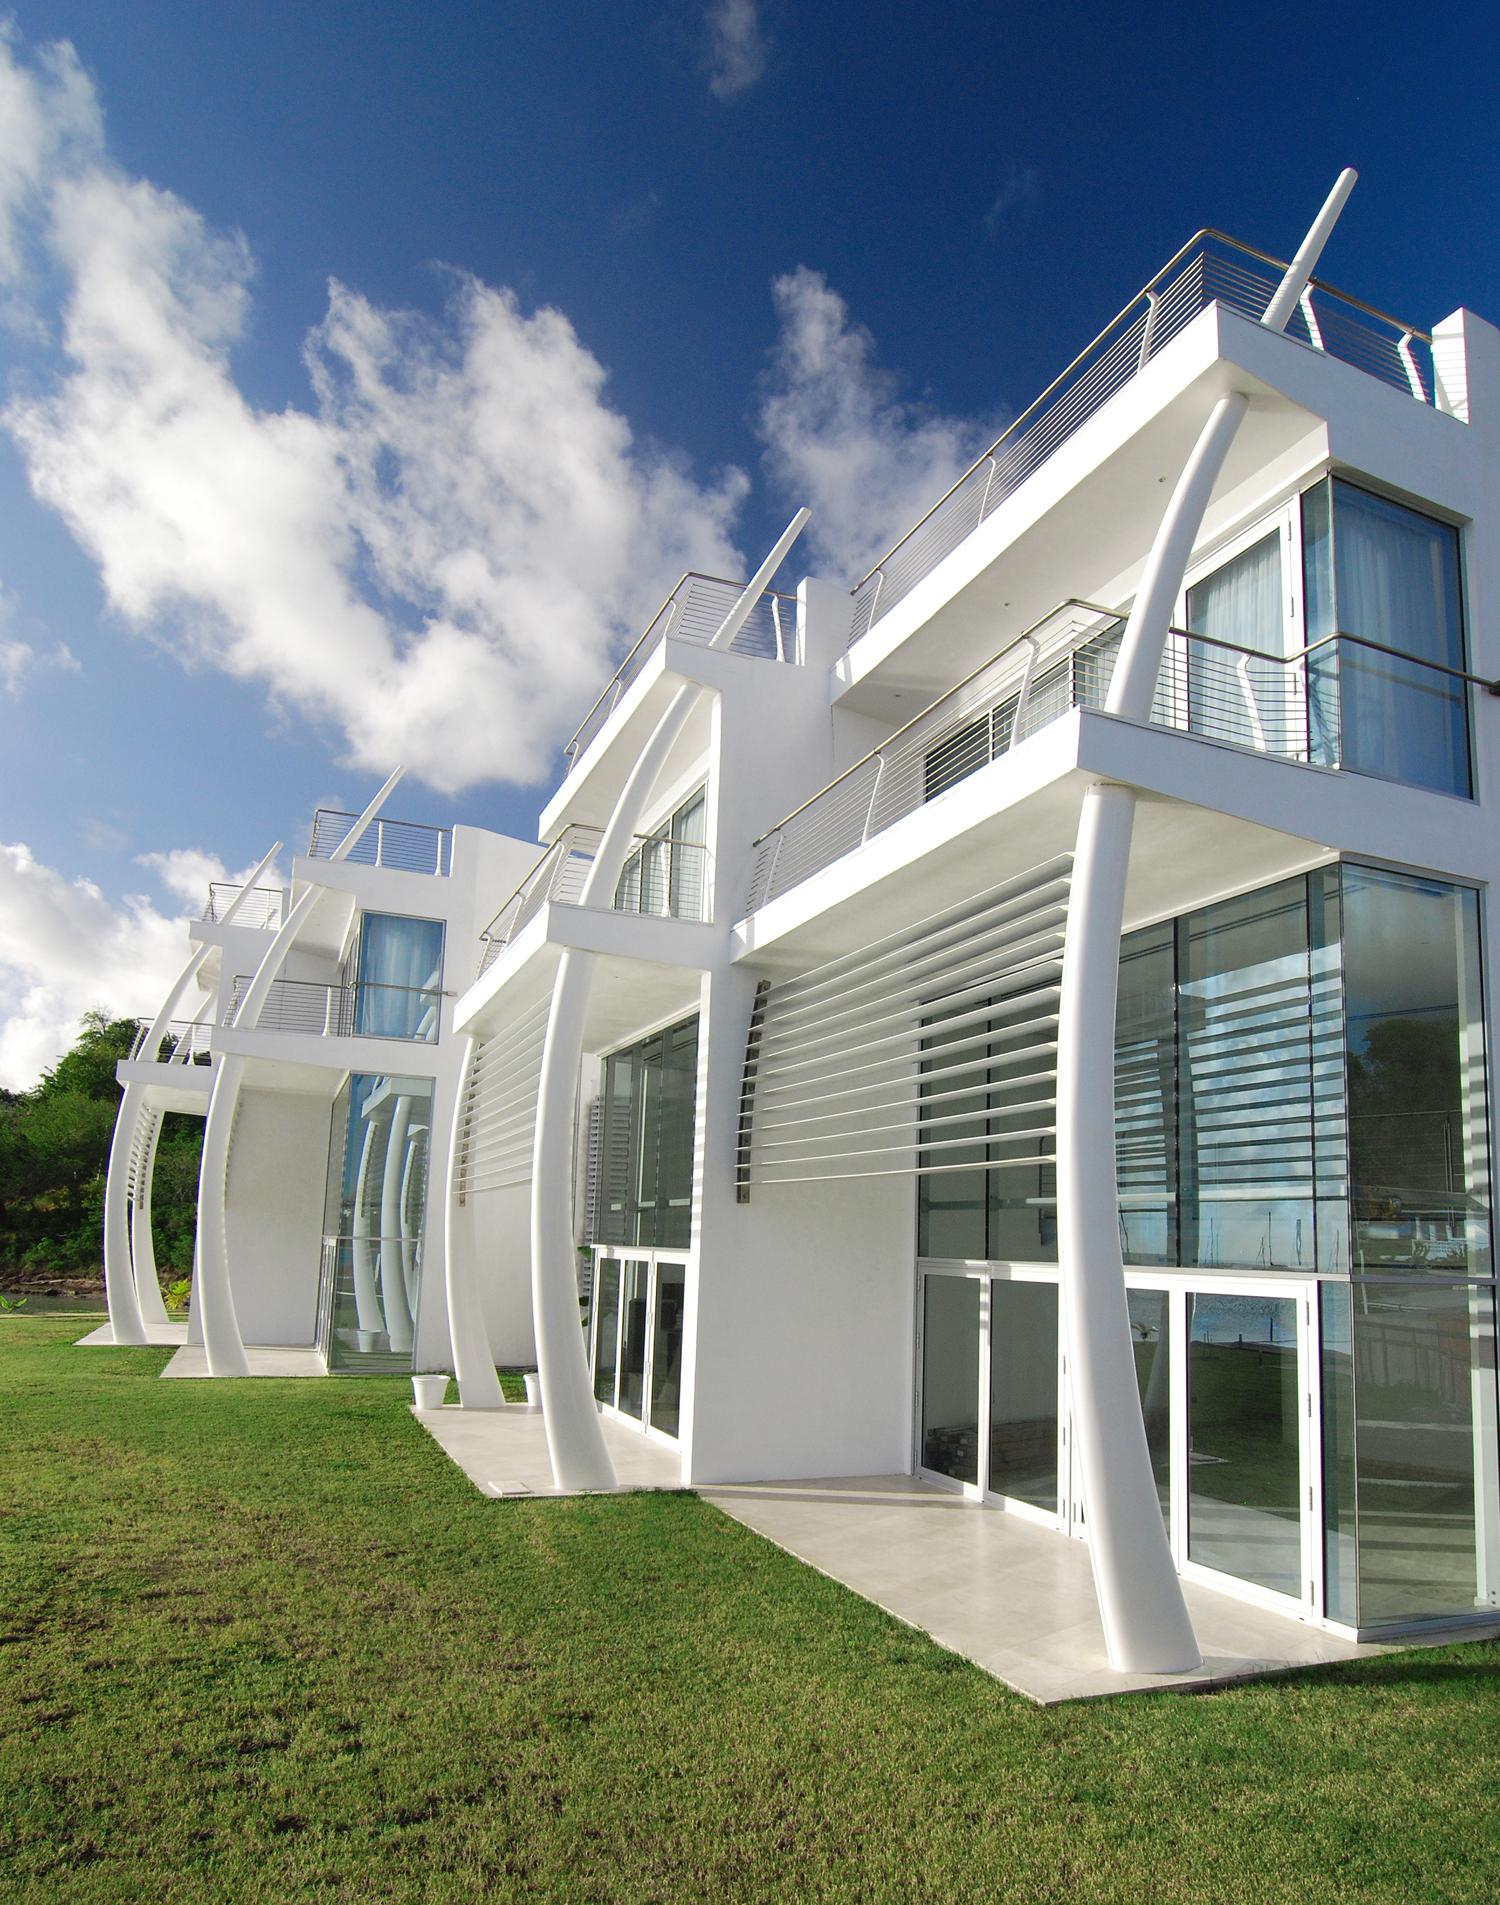 Lawn Houses 1FLIPPEd.jpg